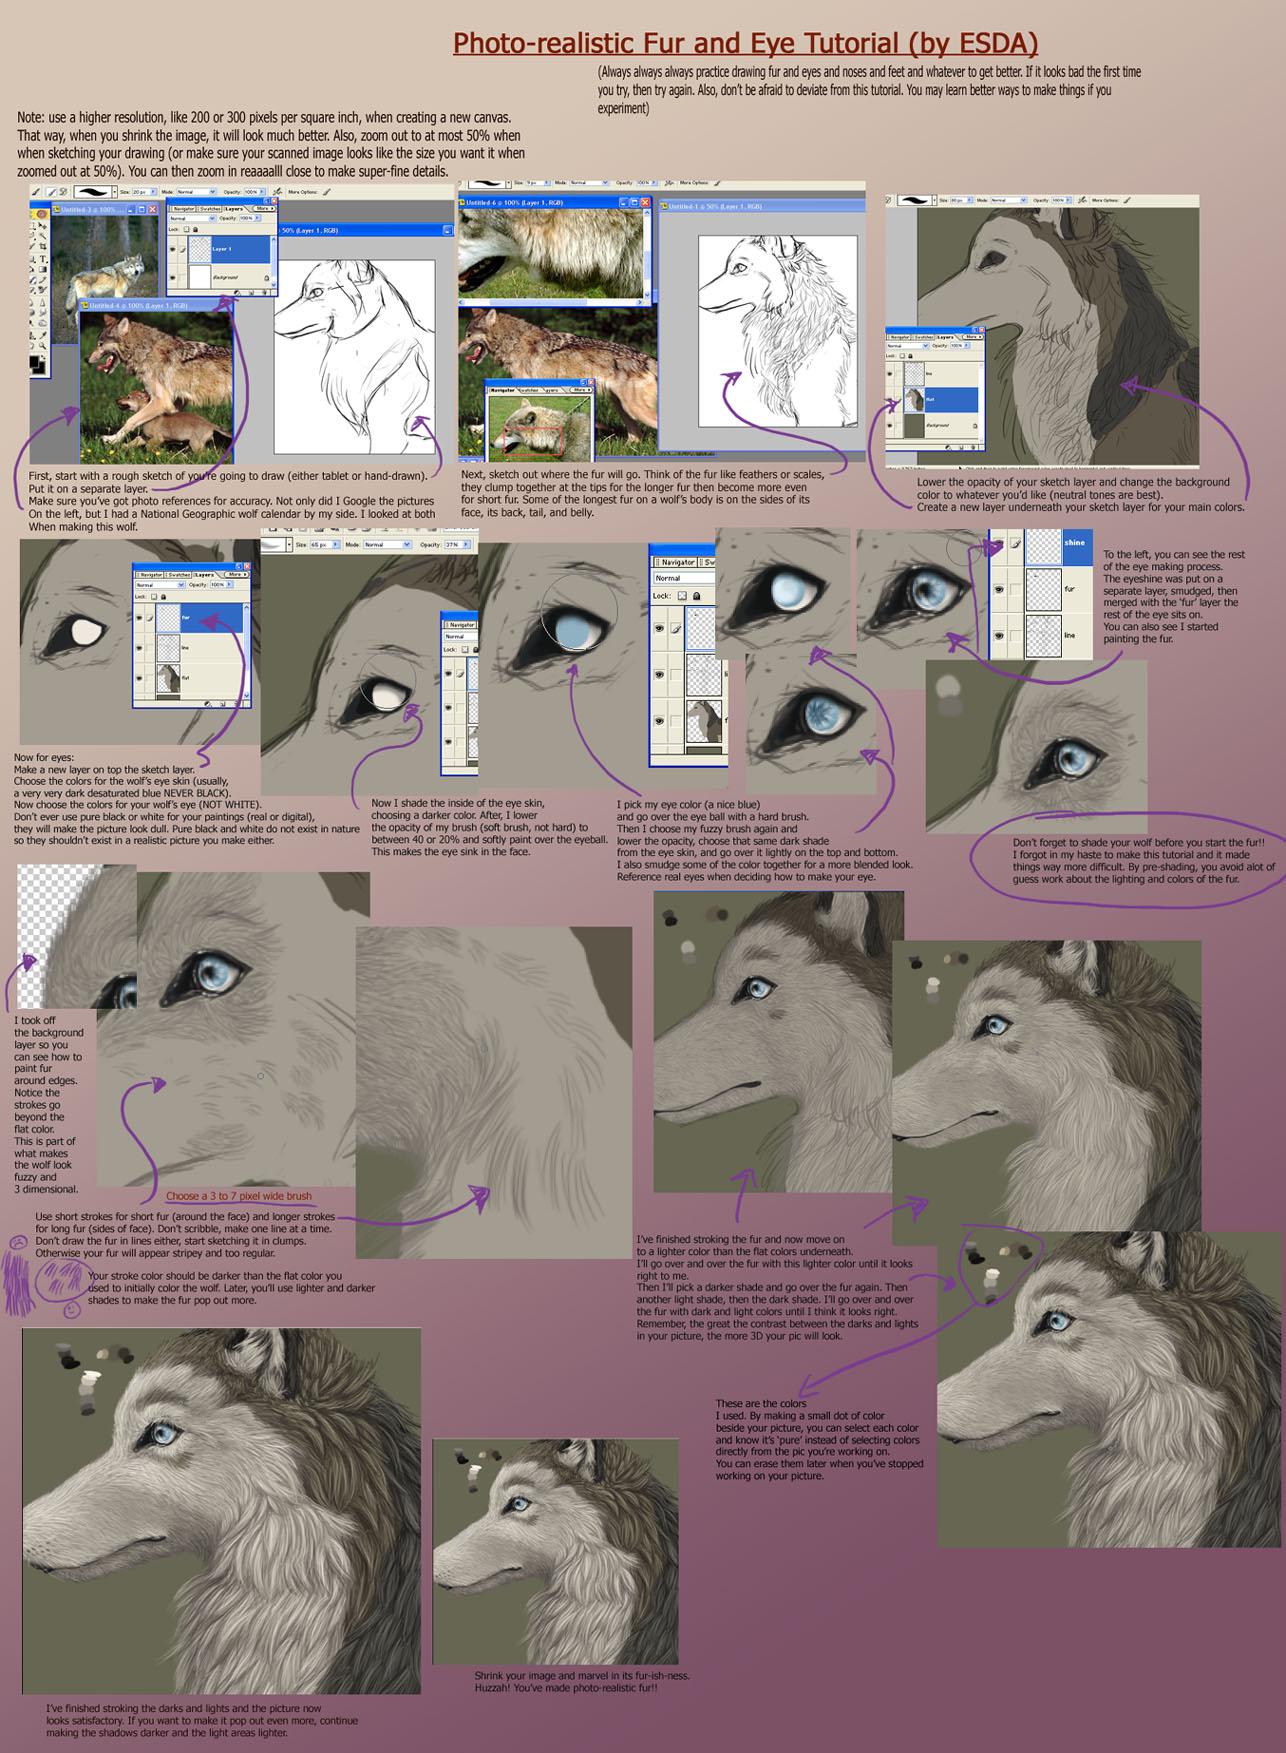 Fur and Eye Tutorial